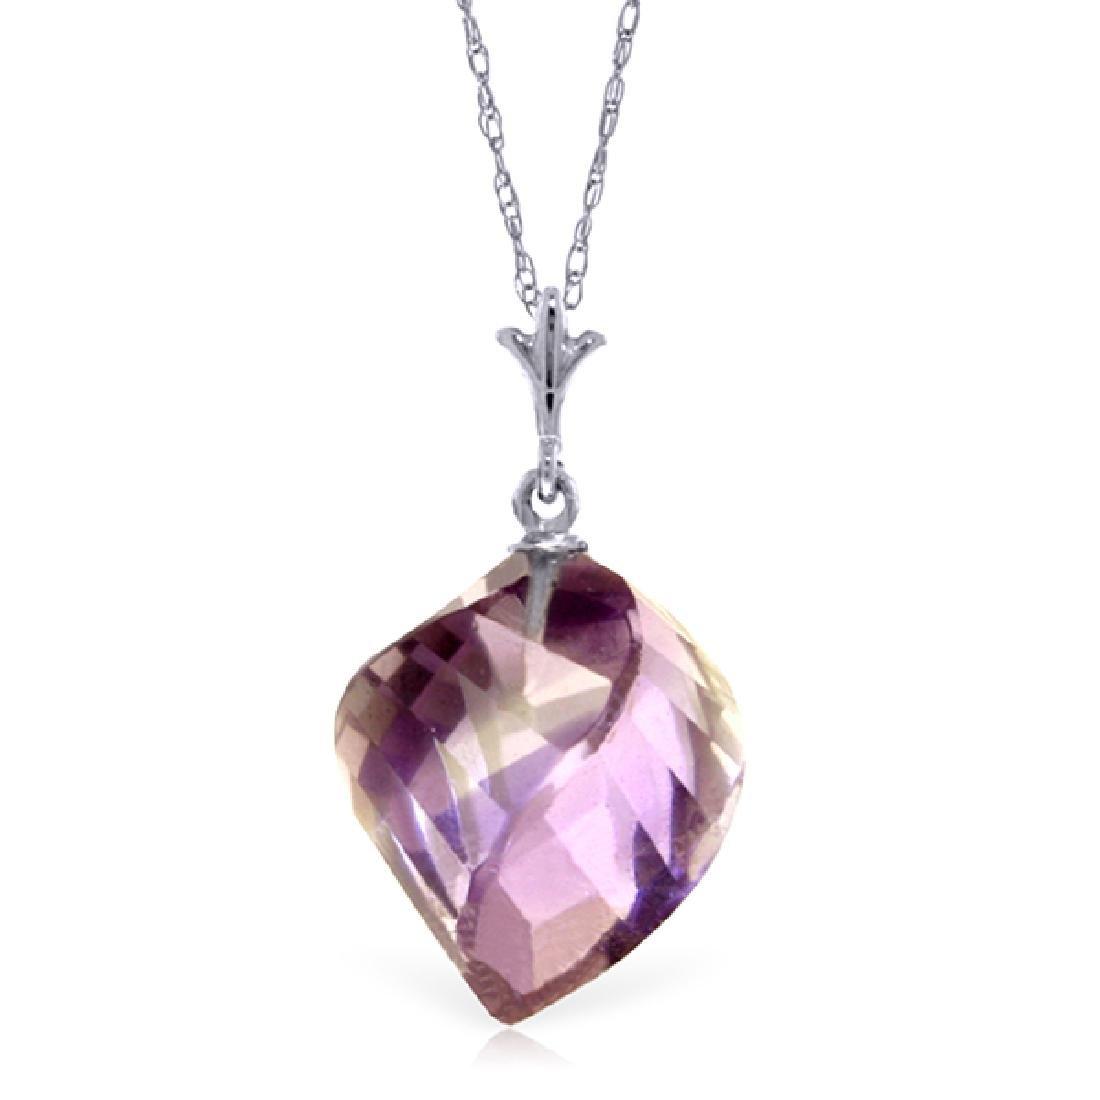 Genuine 10.75 ctw Amethyst Necklace Jewelry 14KT White